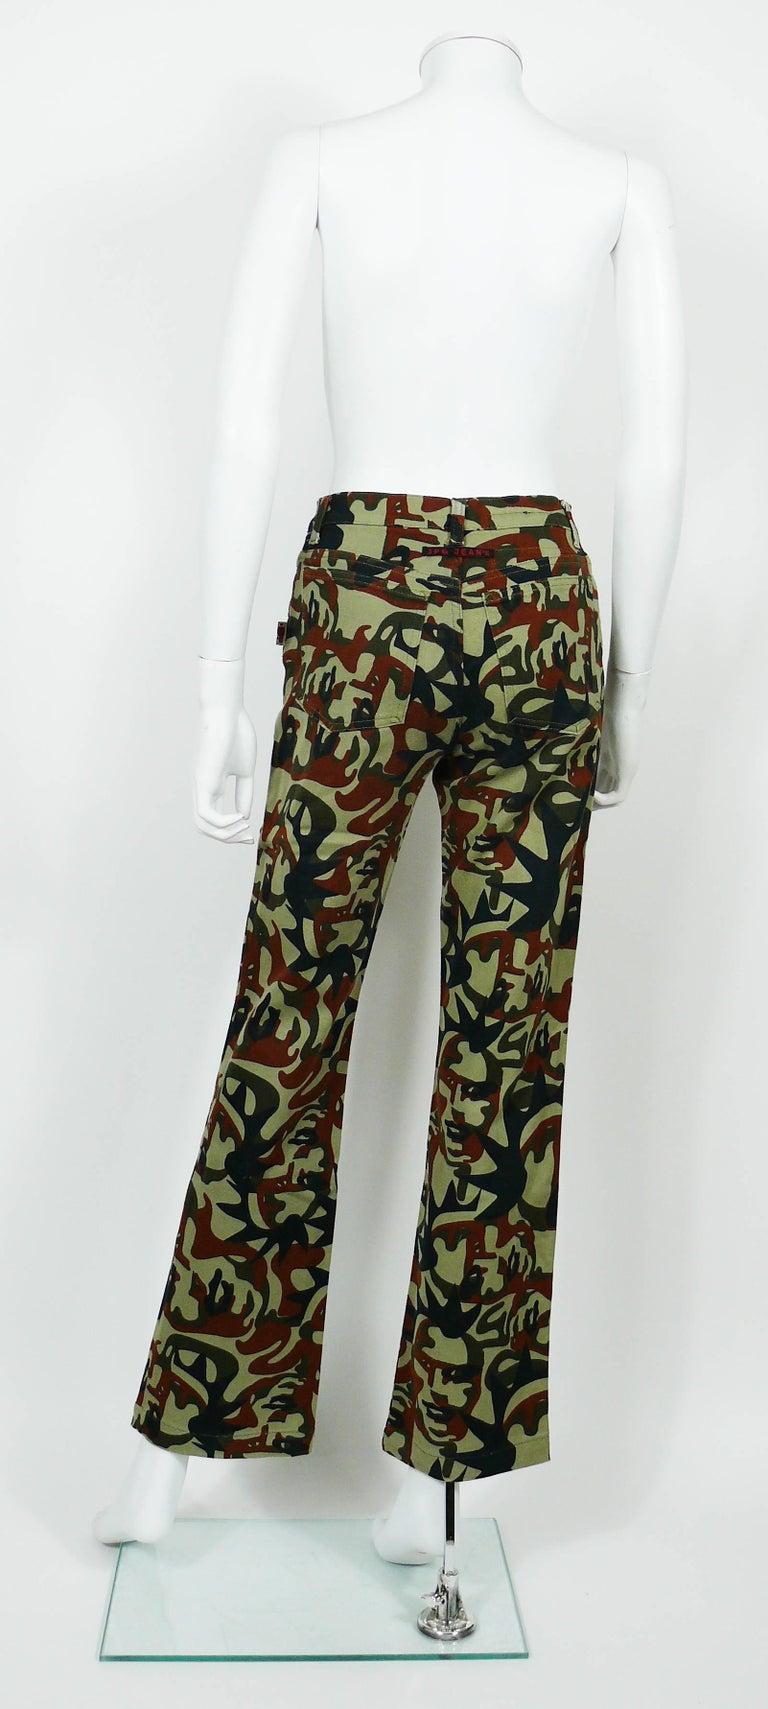 Jean Paul Gaultier Vintage Camouflage Faces Pants Trousers For Sale 2